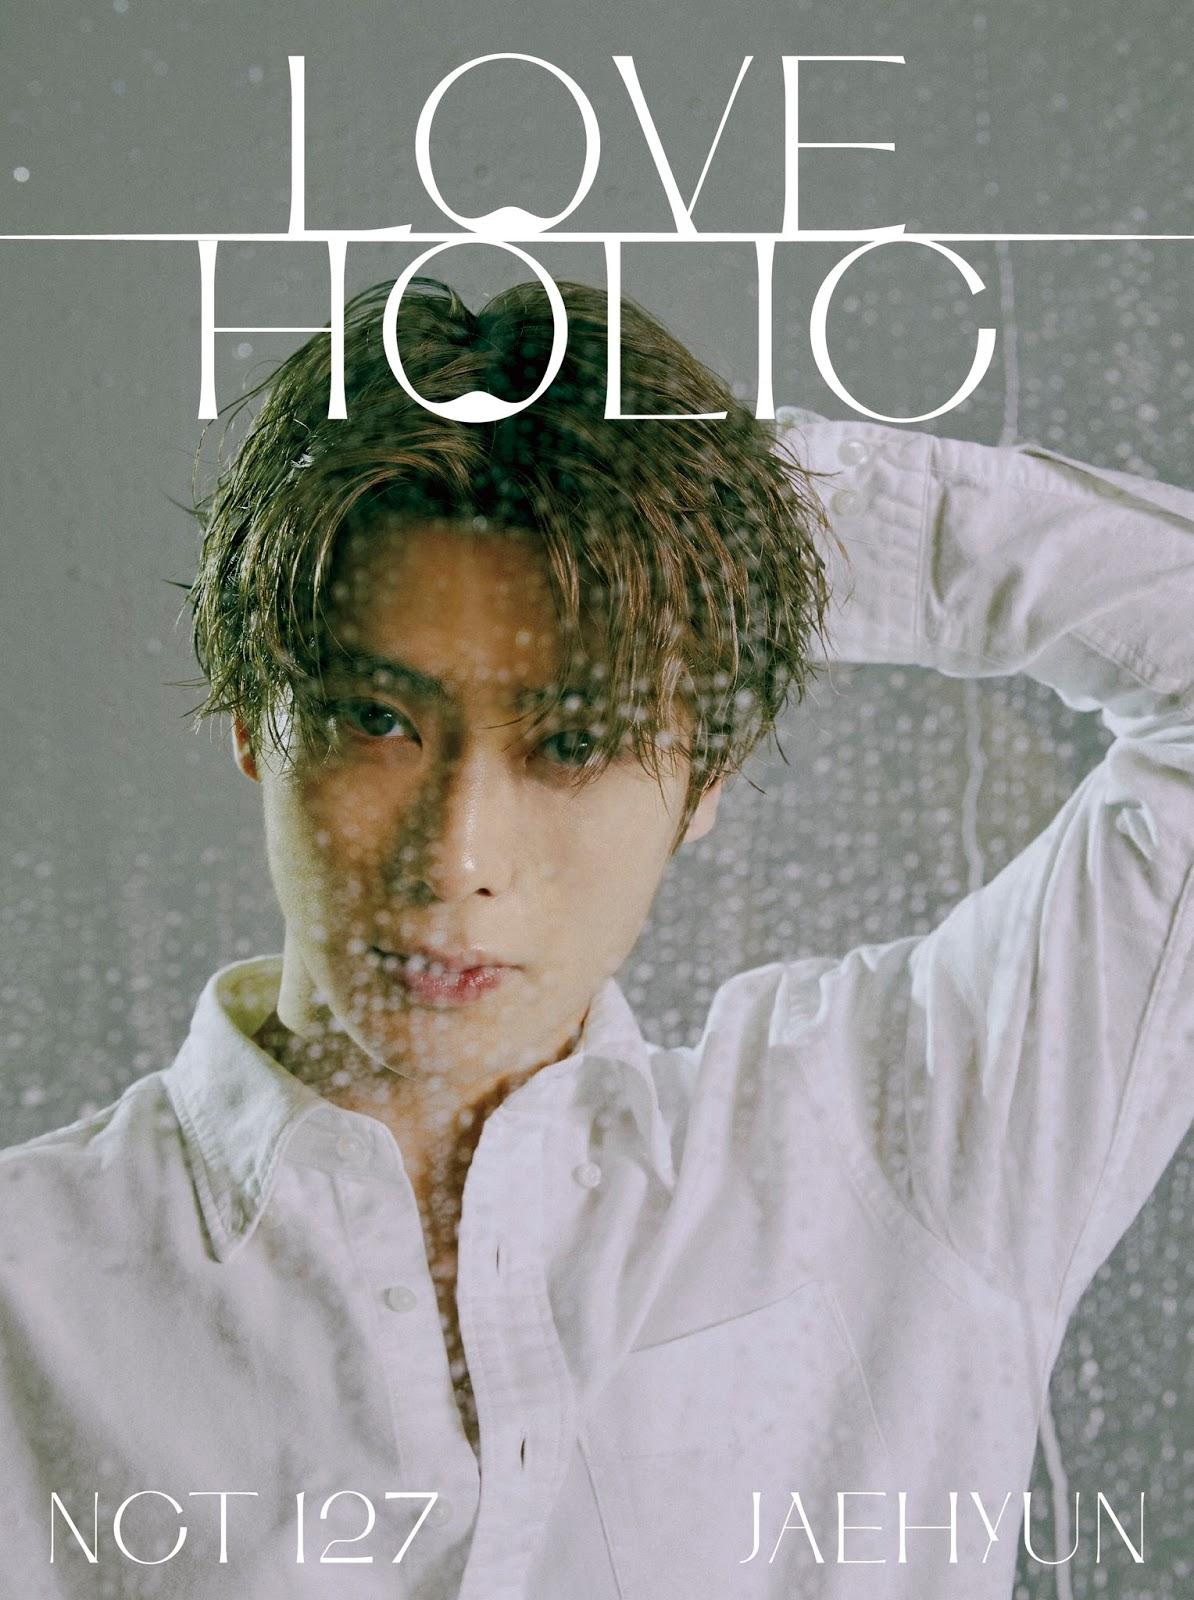 nct127 loveholic comeback japon jaehyun